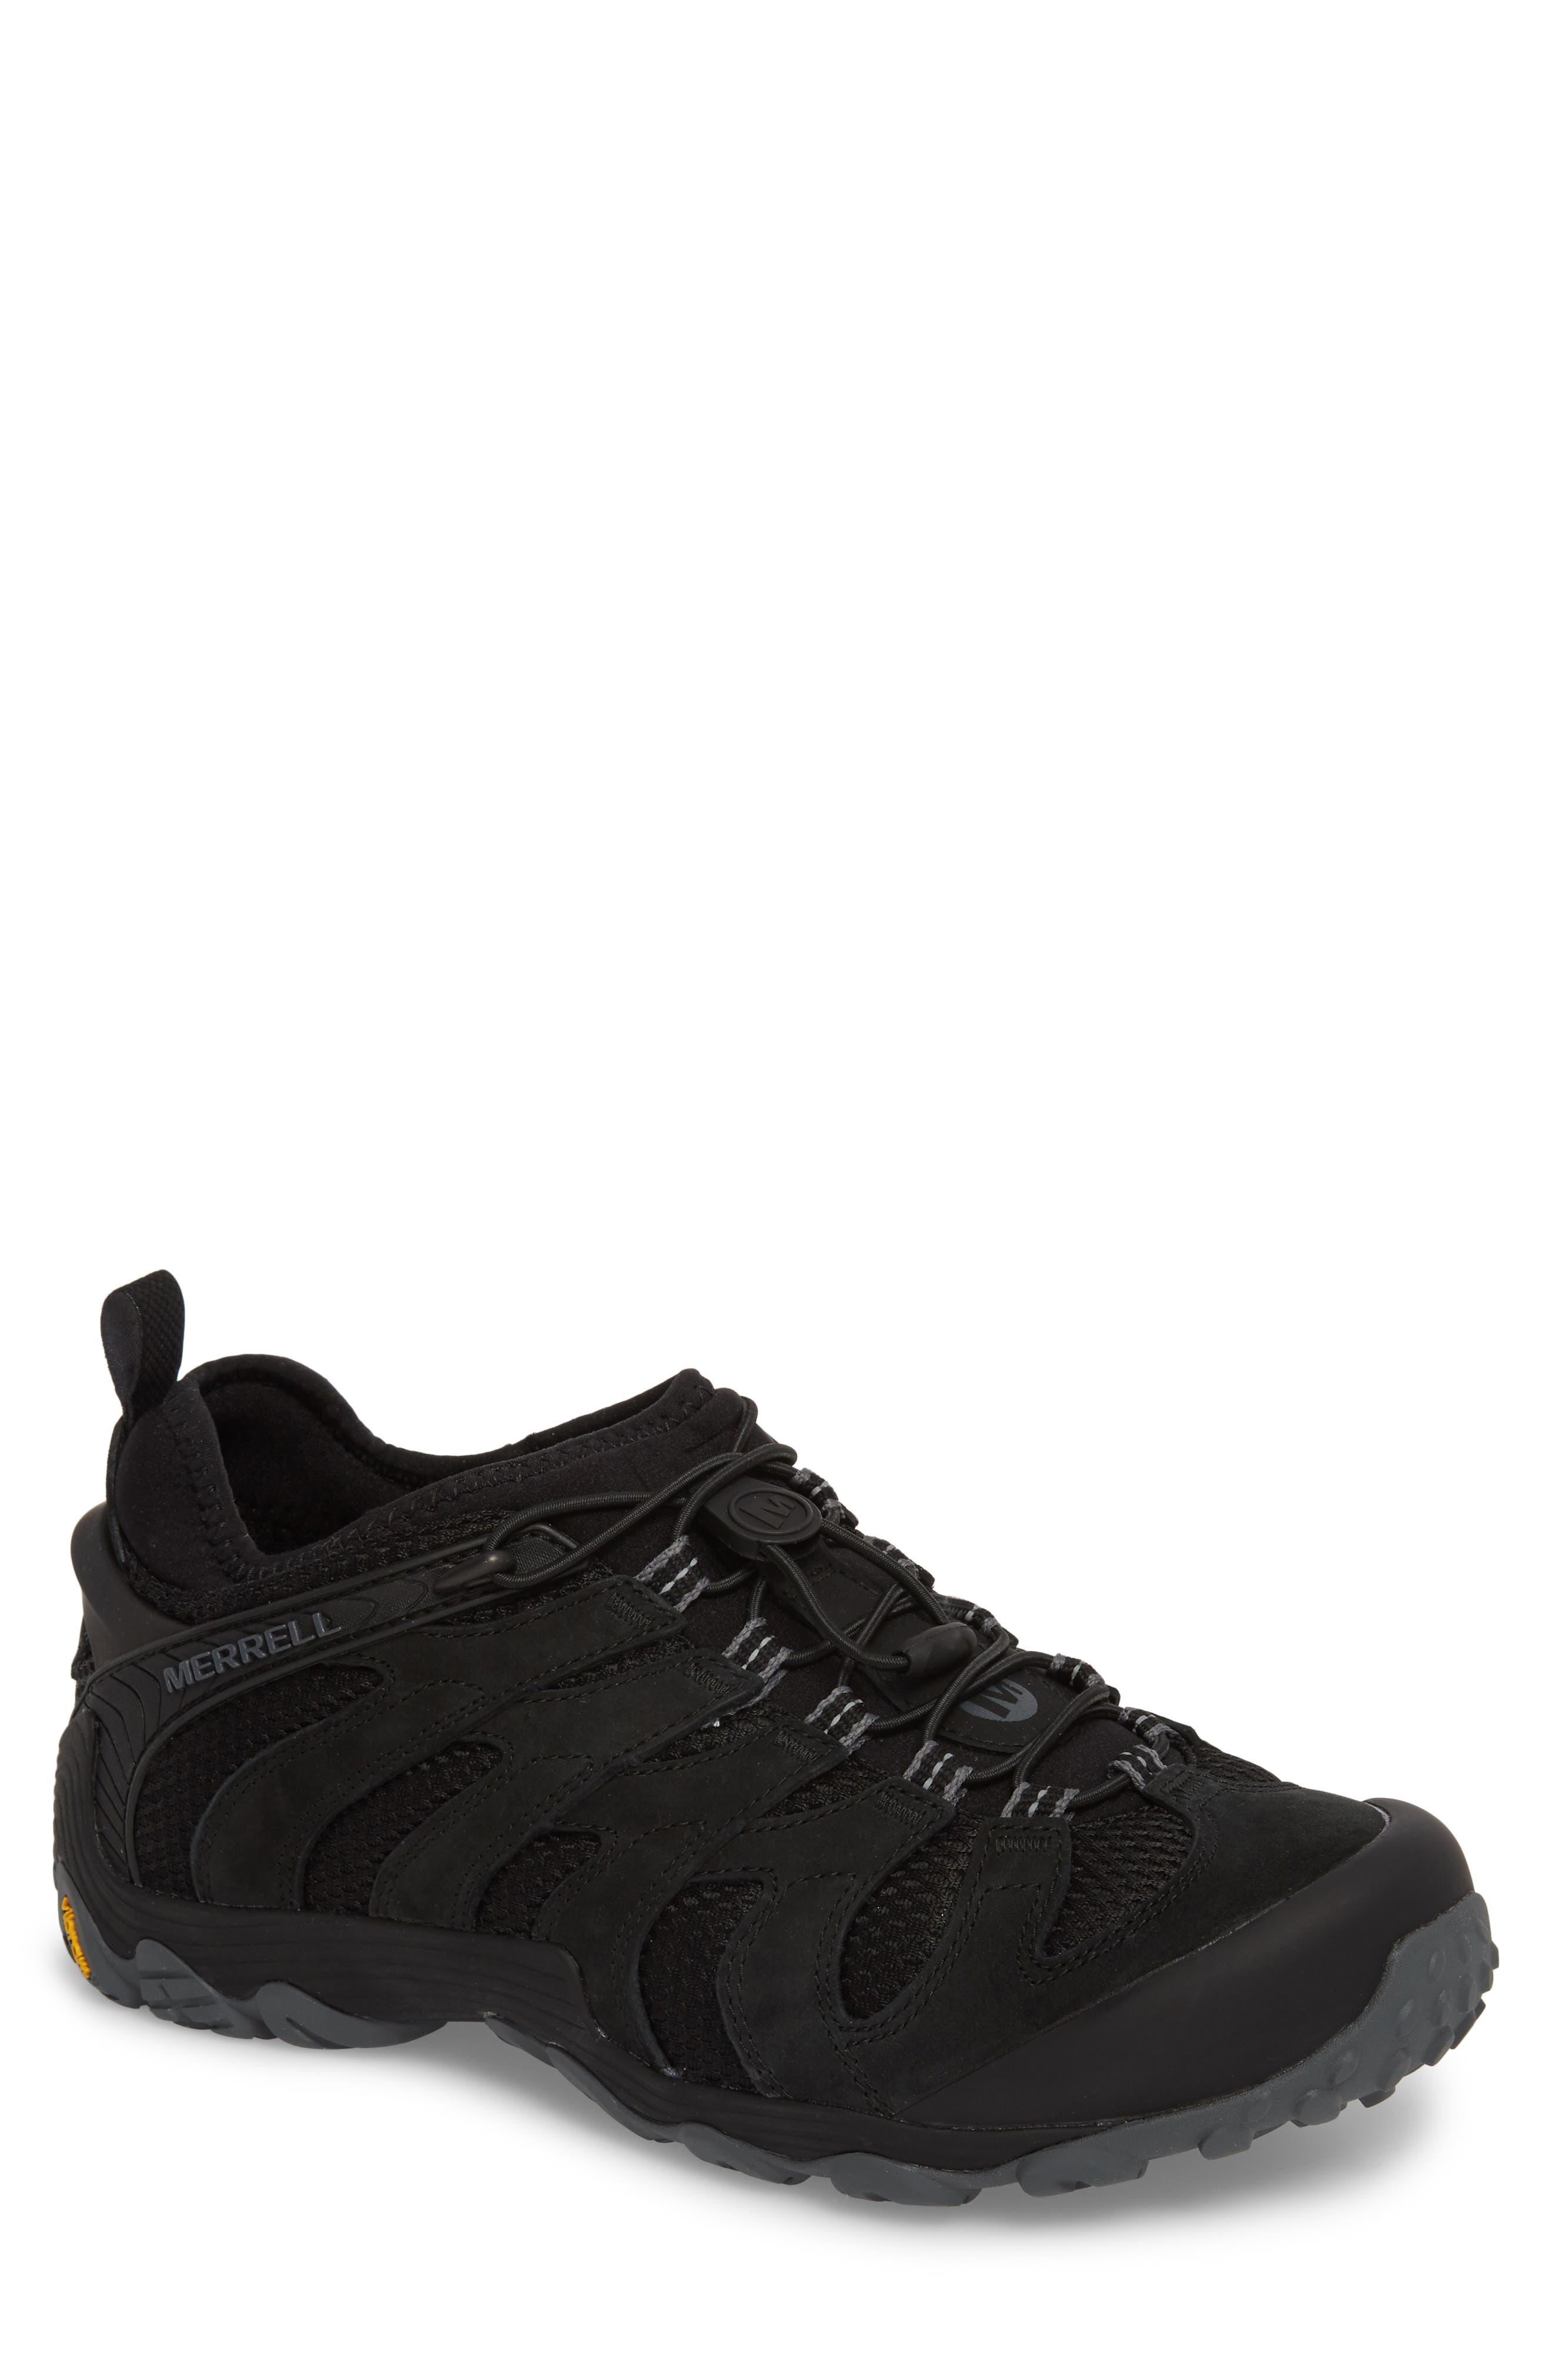 MERRELL, Chameleon 7 Stretch Hiking Shoe, Main thumbnail 1, color, BLACK